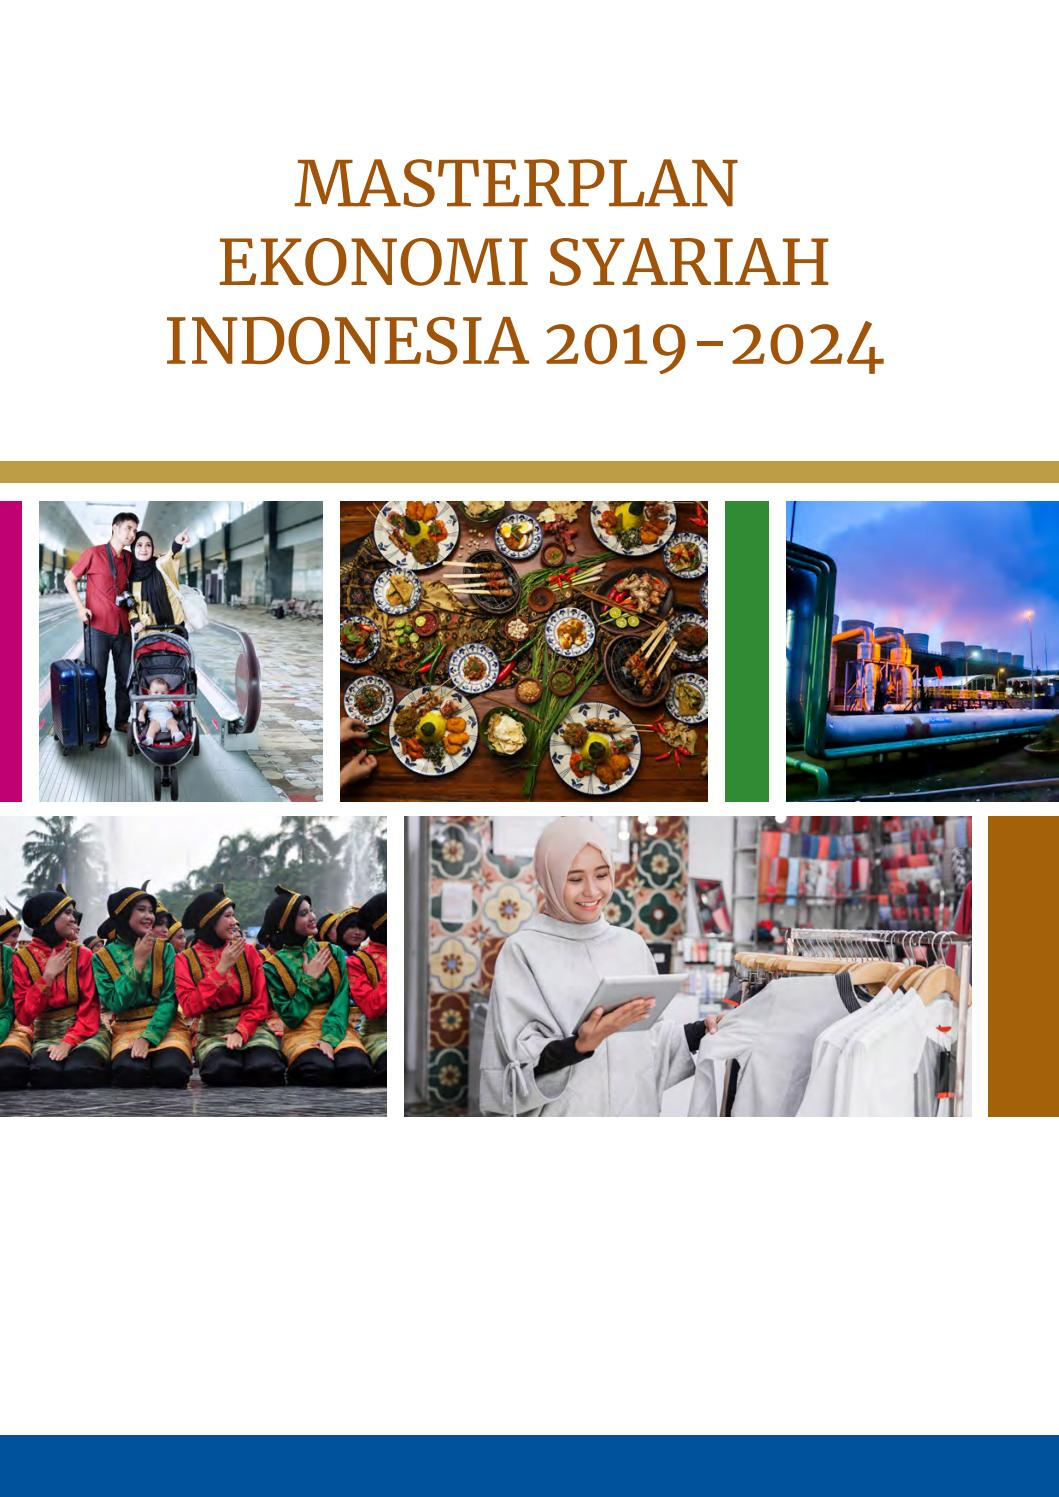 Karena jaman sekarang hampir setiap daerah memiliki makanan khas. Masterplan Ekonomi Syariah 2019 2024 By Laskar Peta1945 Issuu